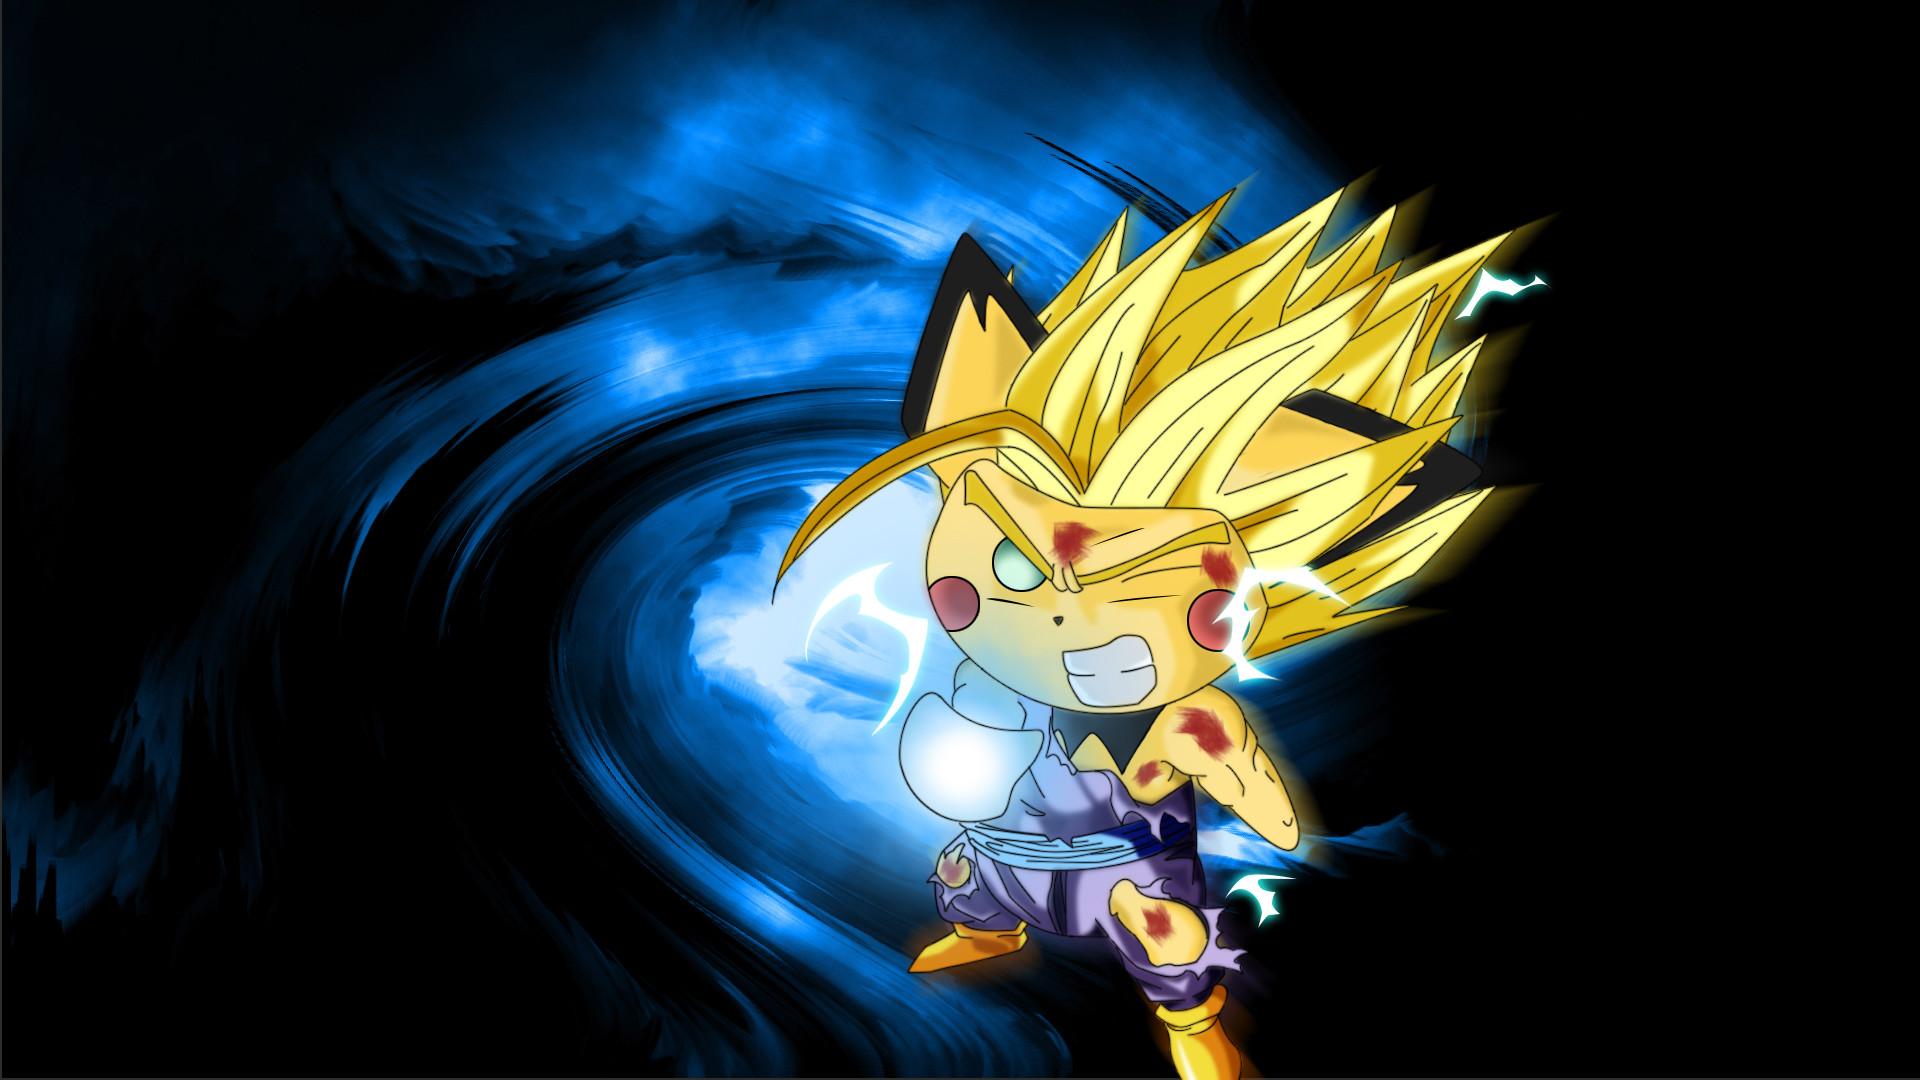 Dbz live wallpapers 66 images - Goku kamehameha live wallpaper ...